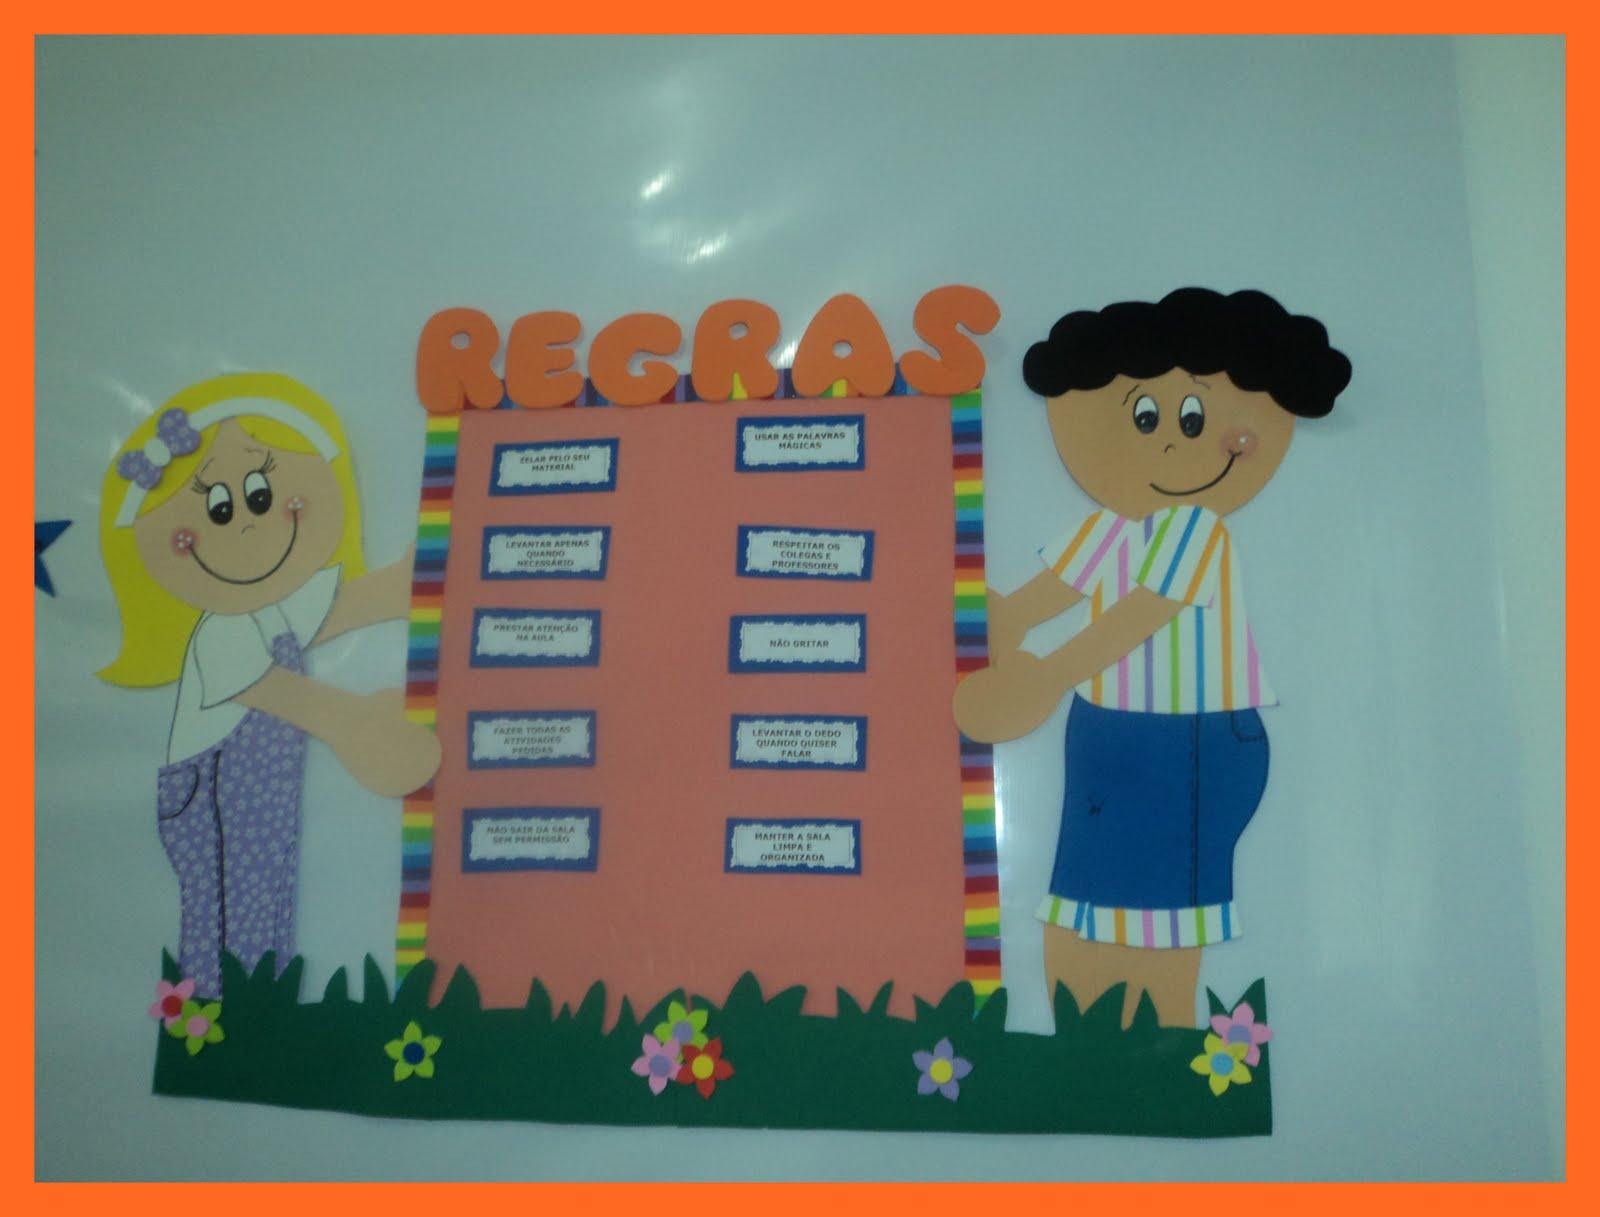 decoracao sala de leitura na escola:segunda-feira, 11 de julho de 2011